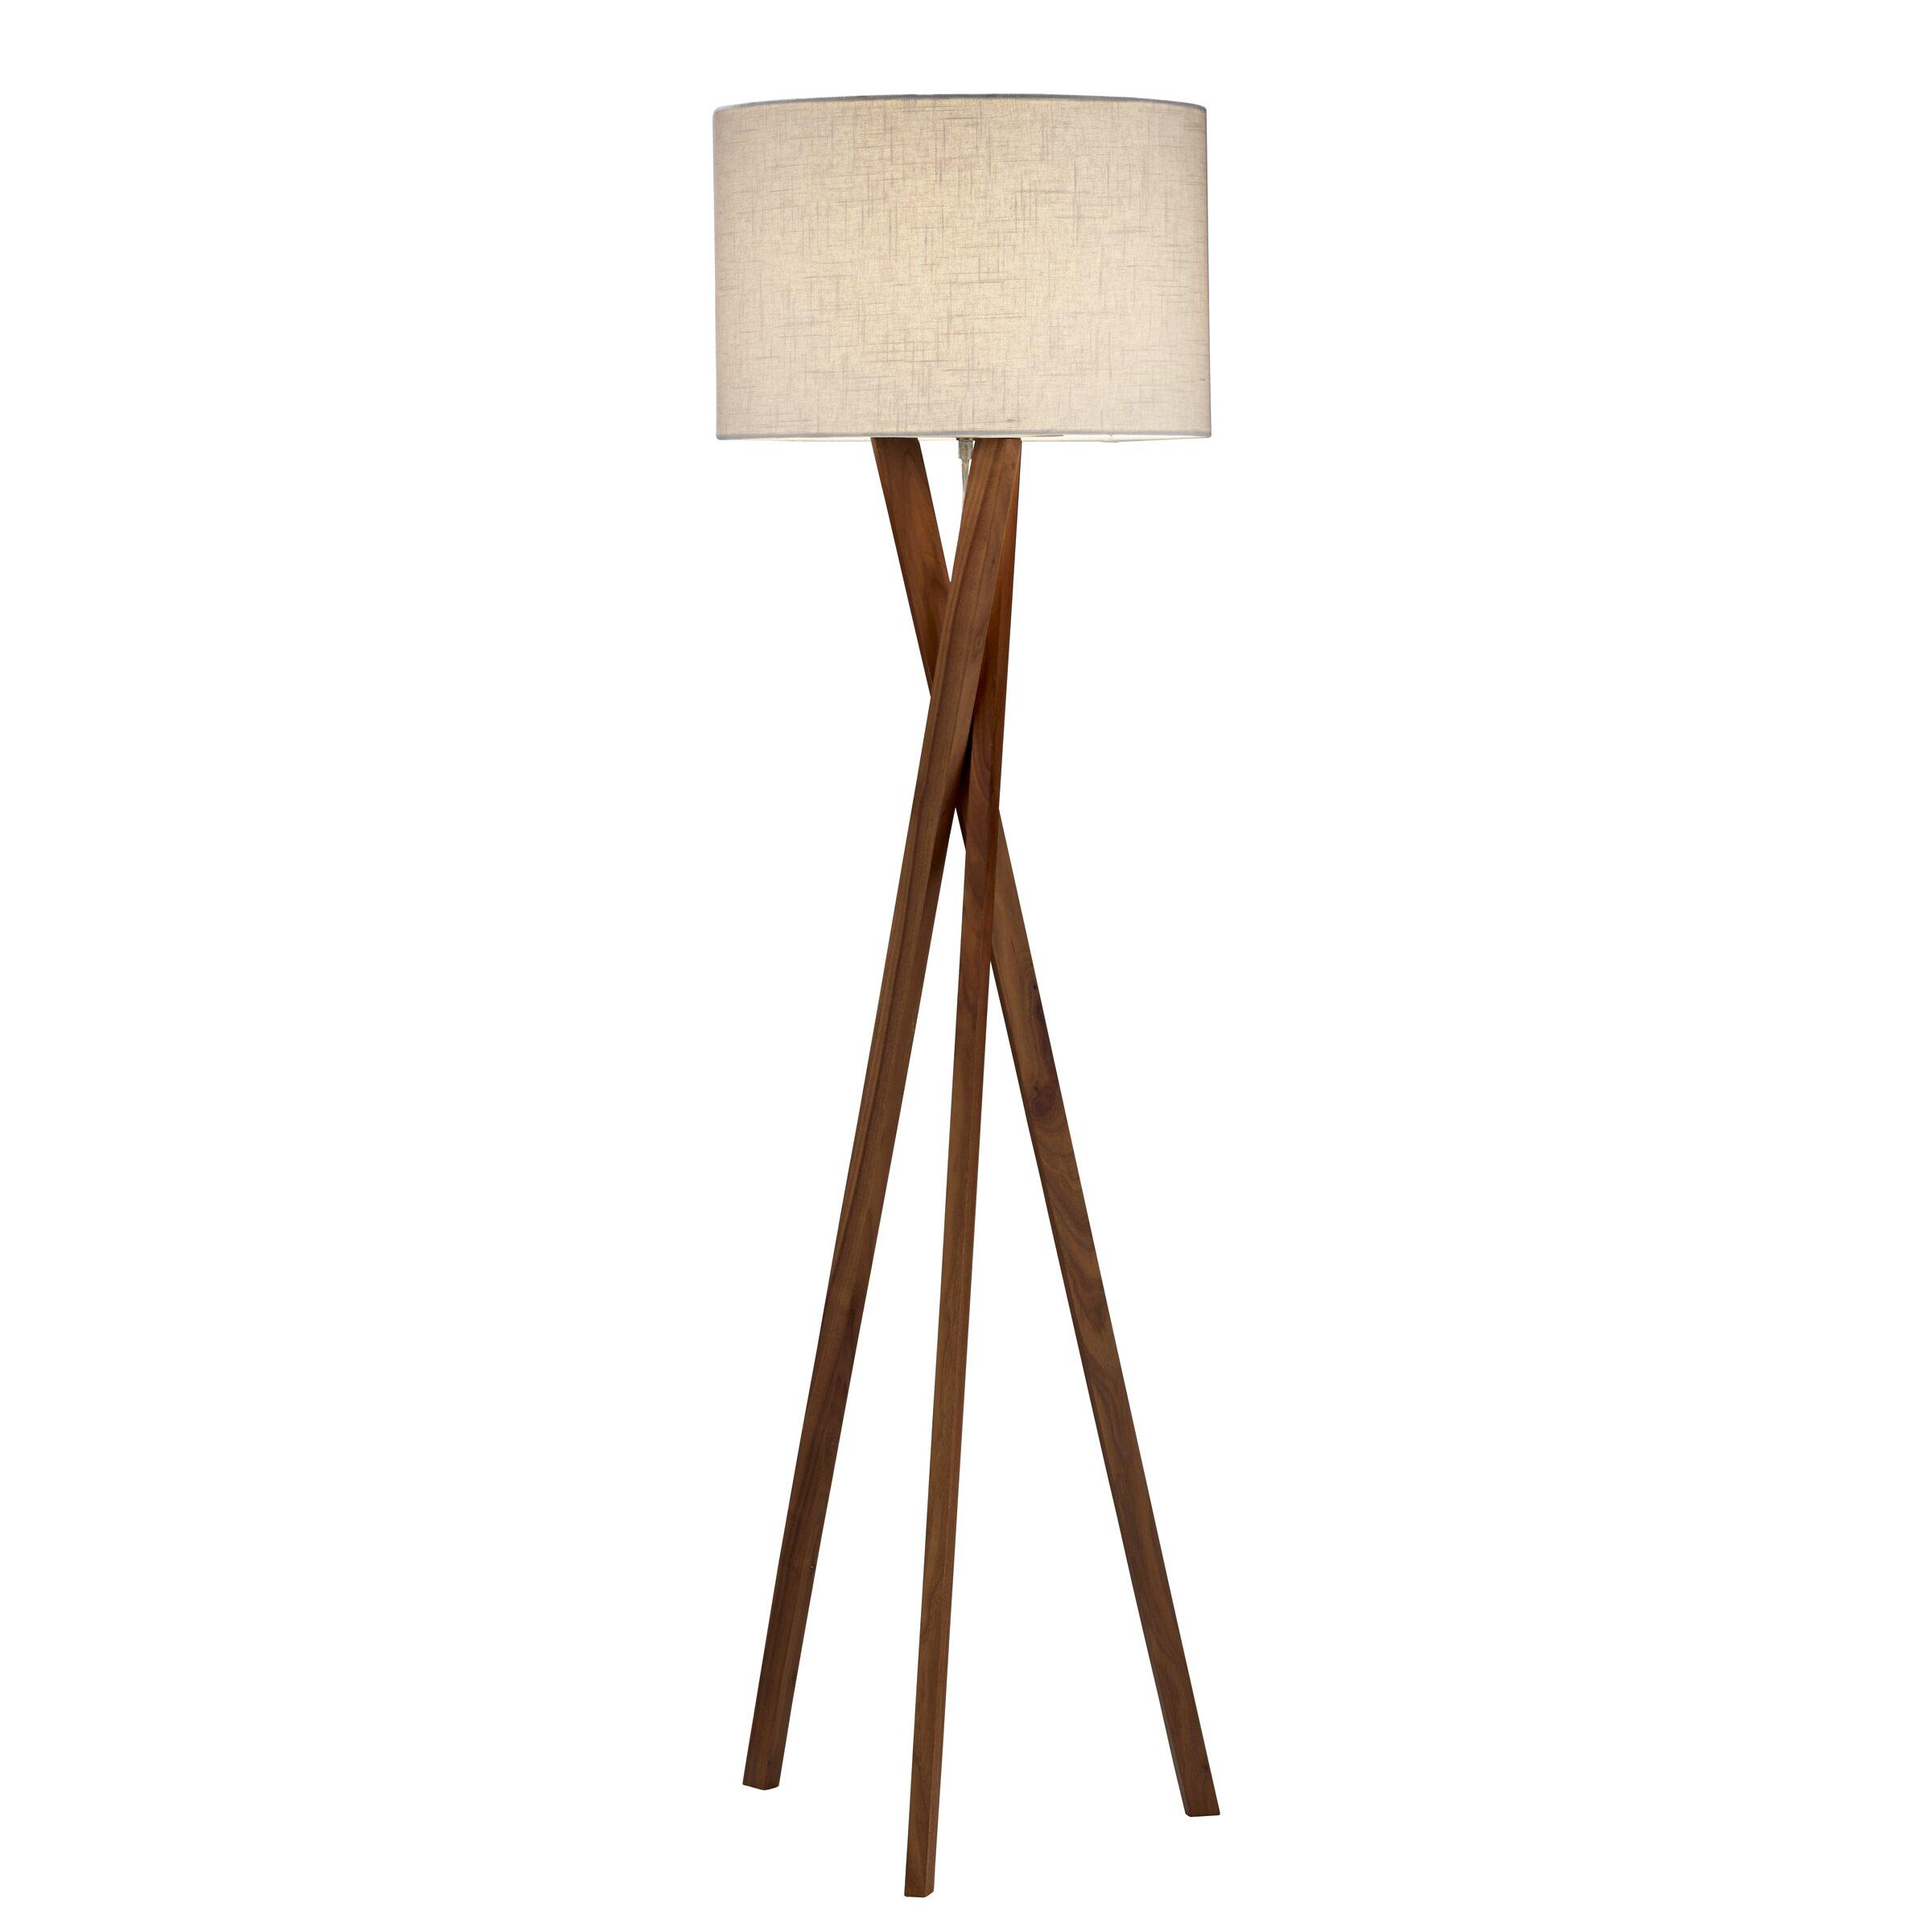 Adesso brooklyn 63quot tripod floor lamp reviews wayfair for Wayfair adesso floor lamp